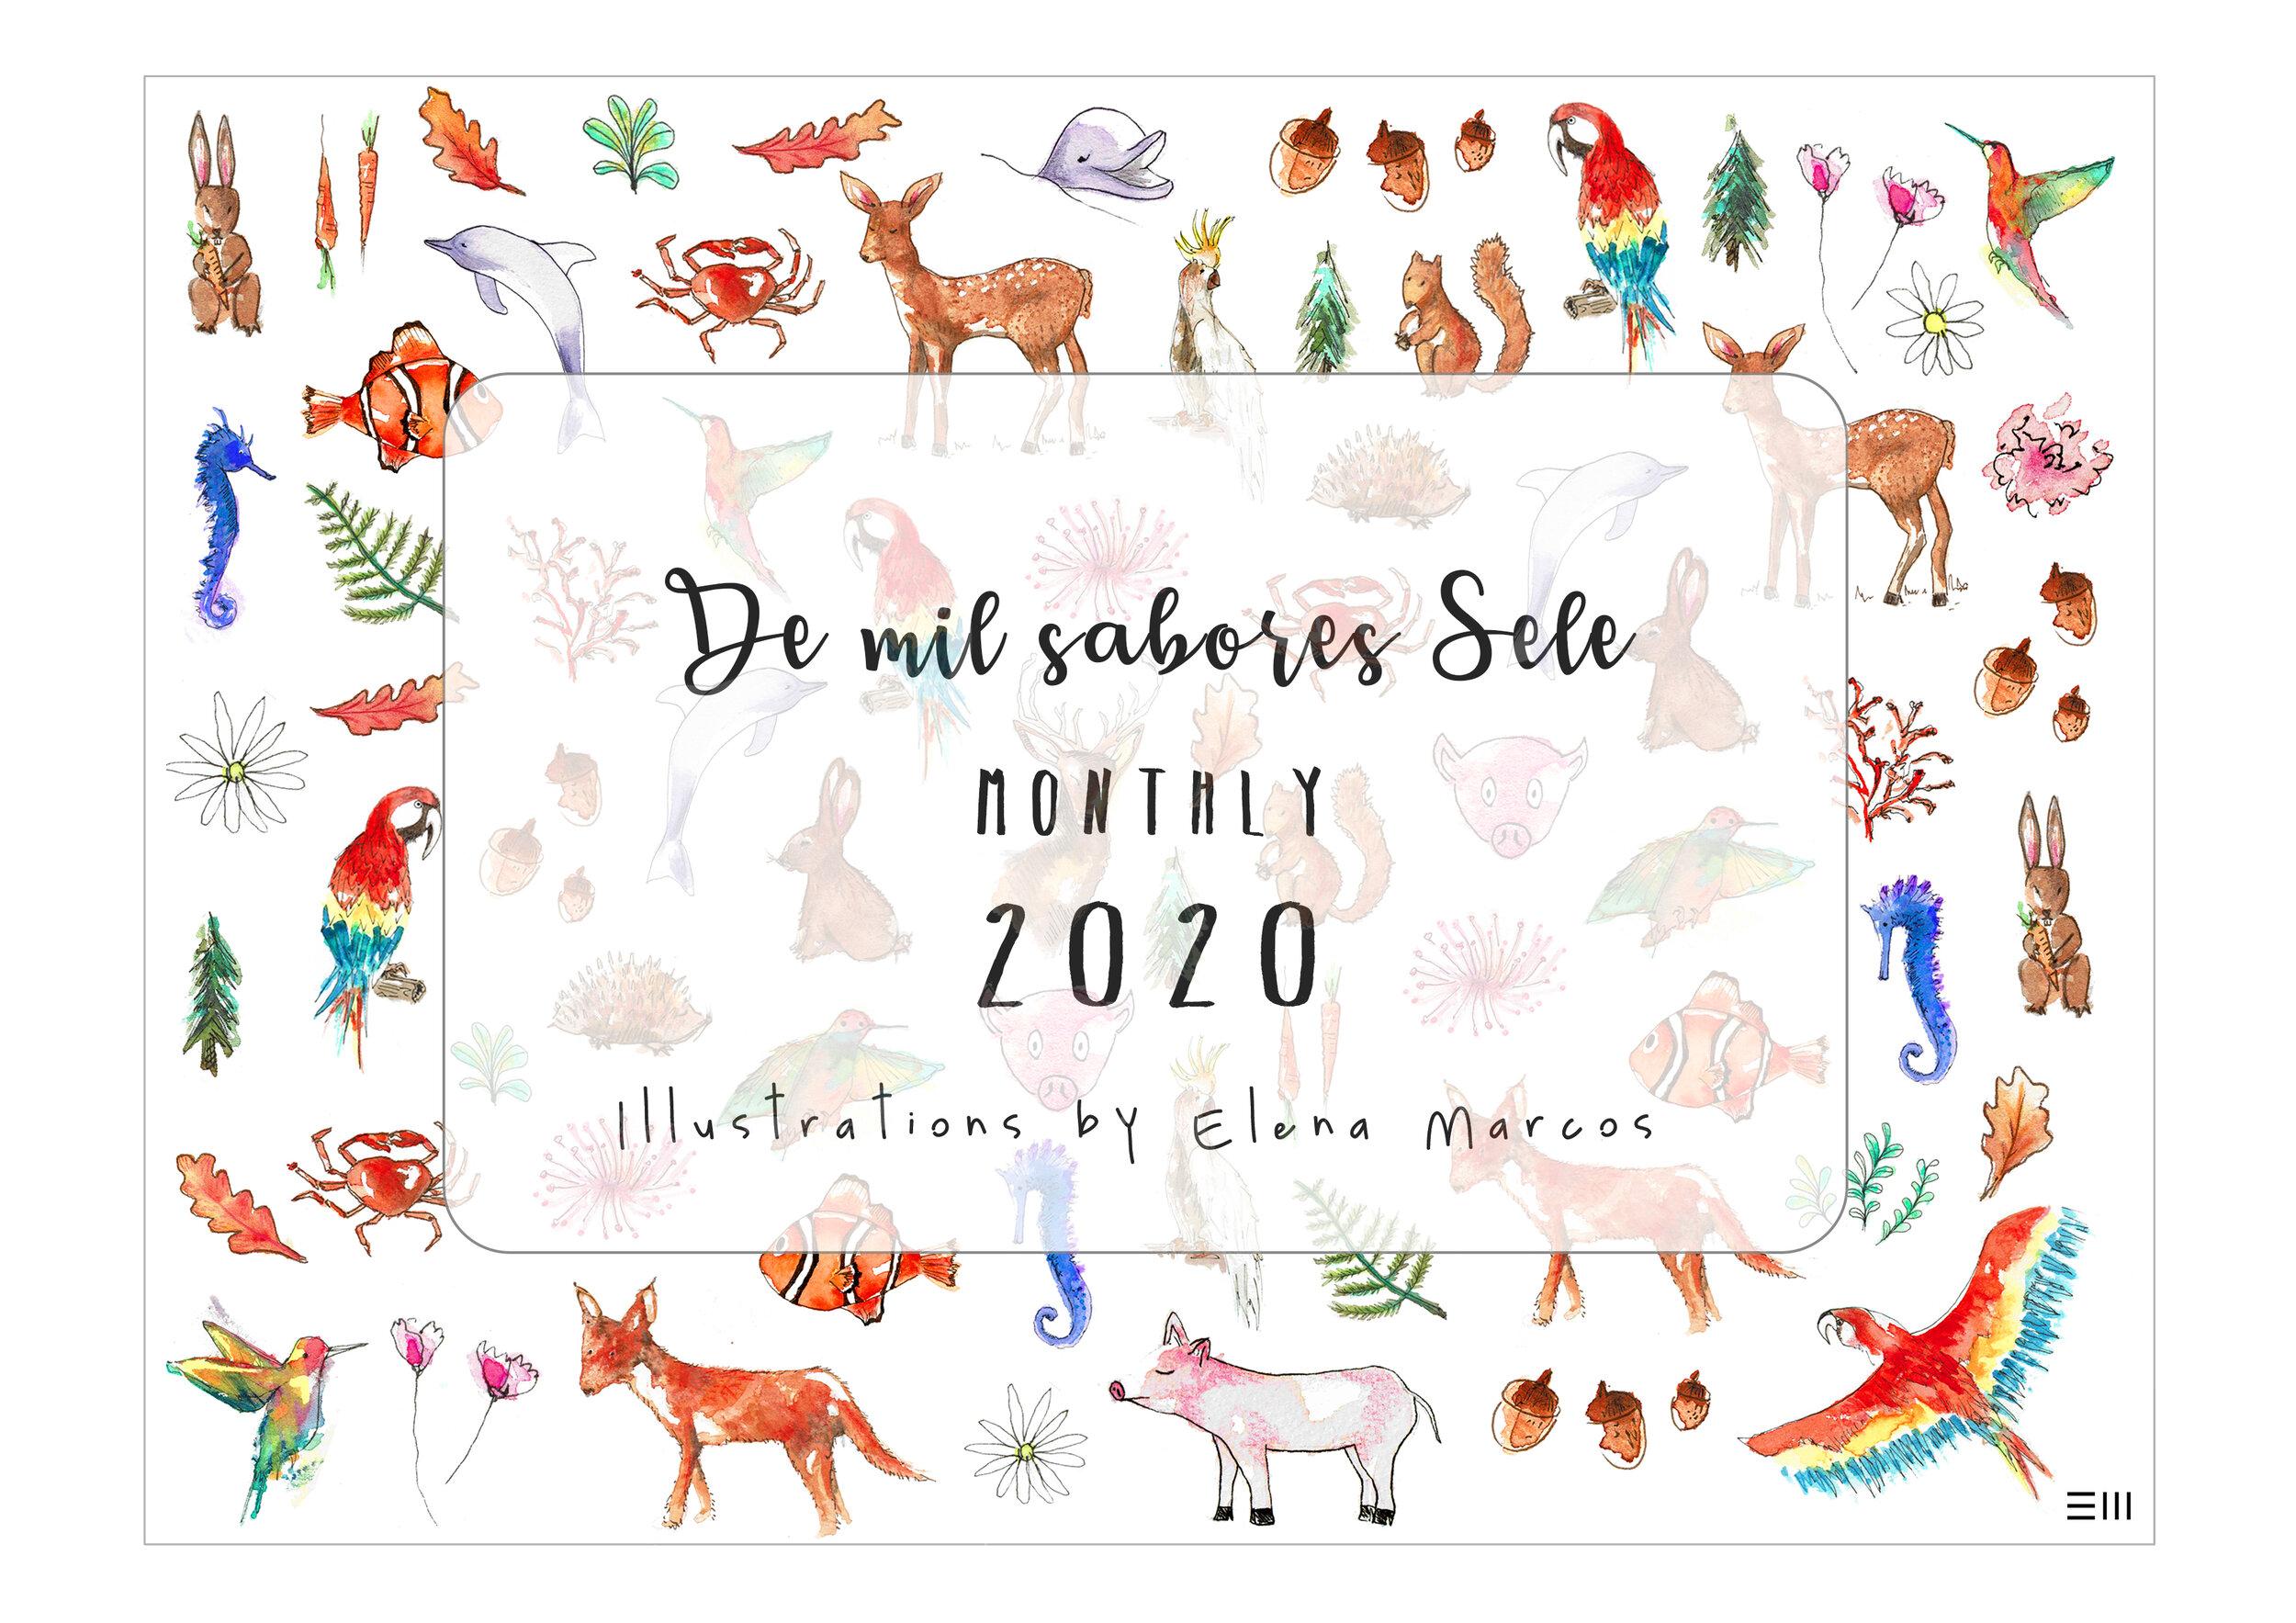 00 MONTHLY PORTADA 2020.jpg